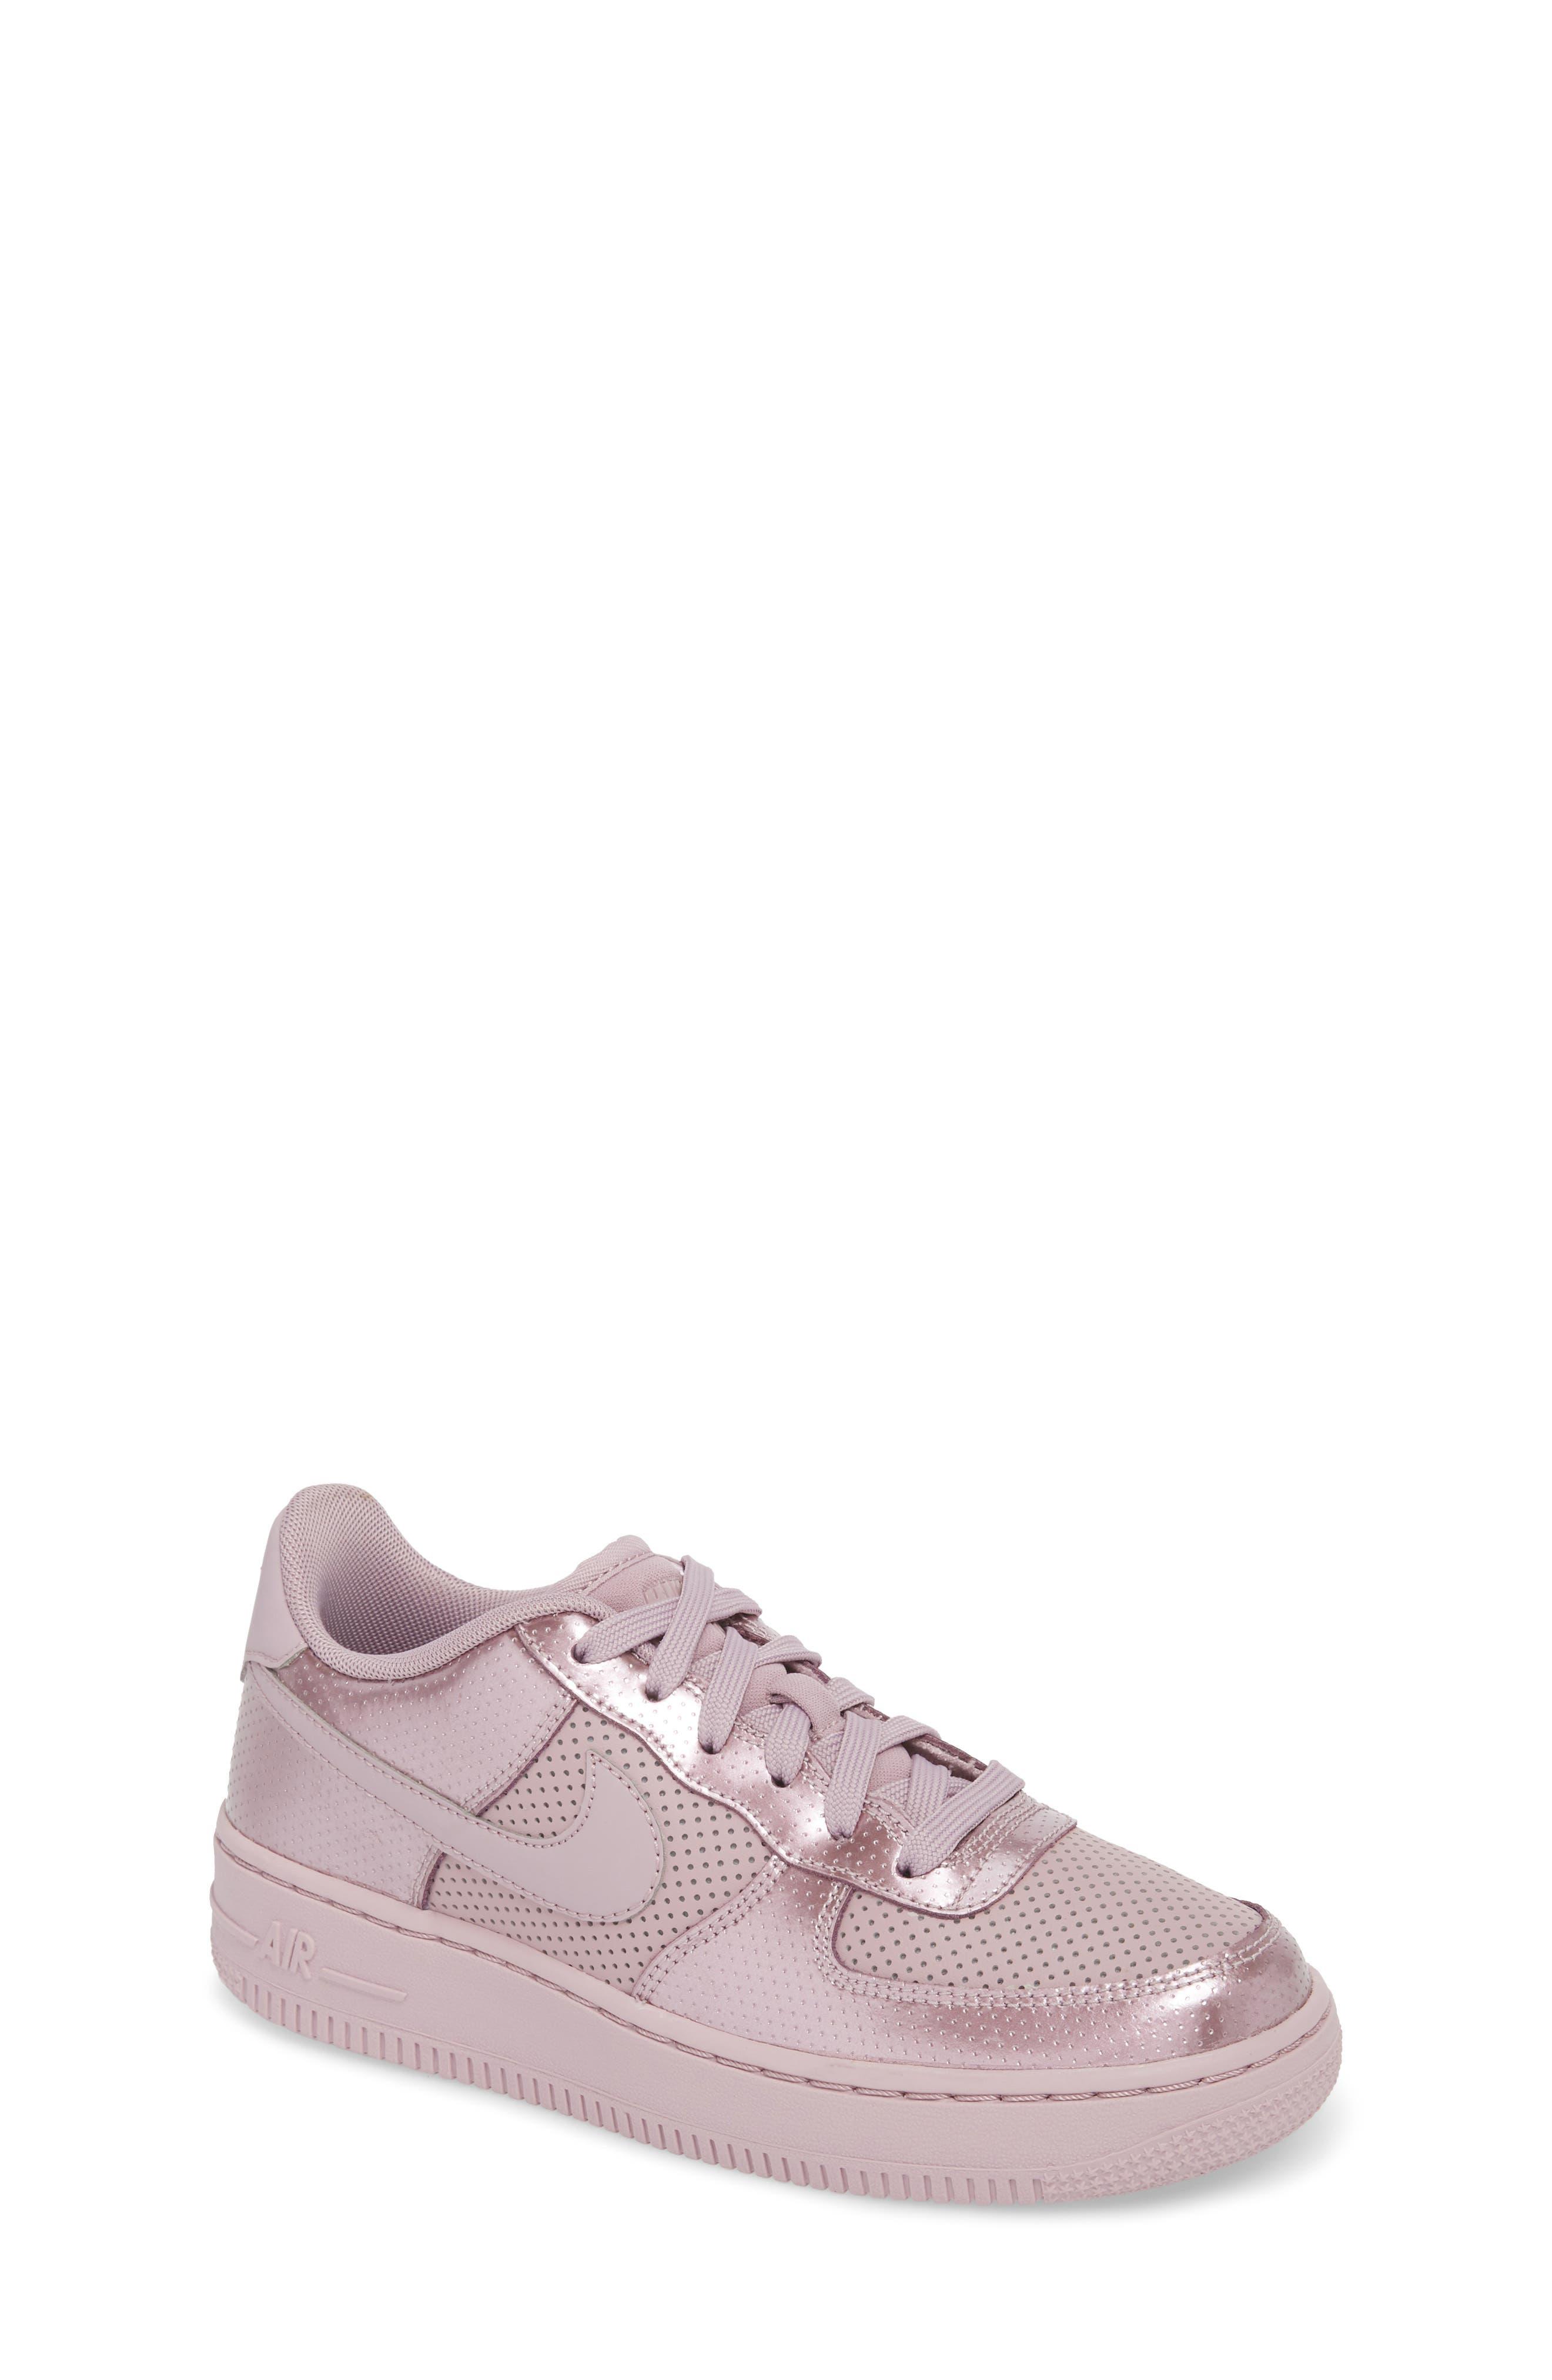 Air Force 1 LV8 Sneaker,                             Main thumbnail 4, color,